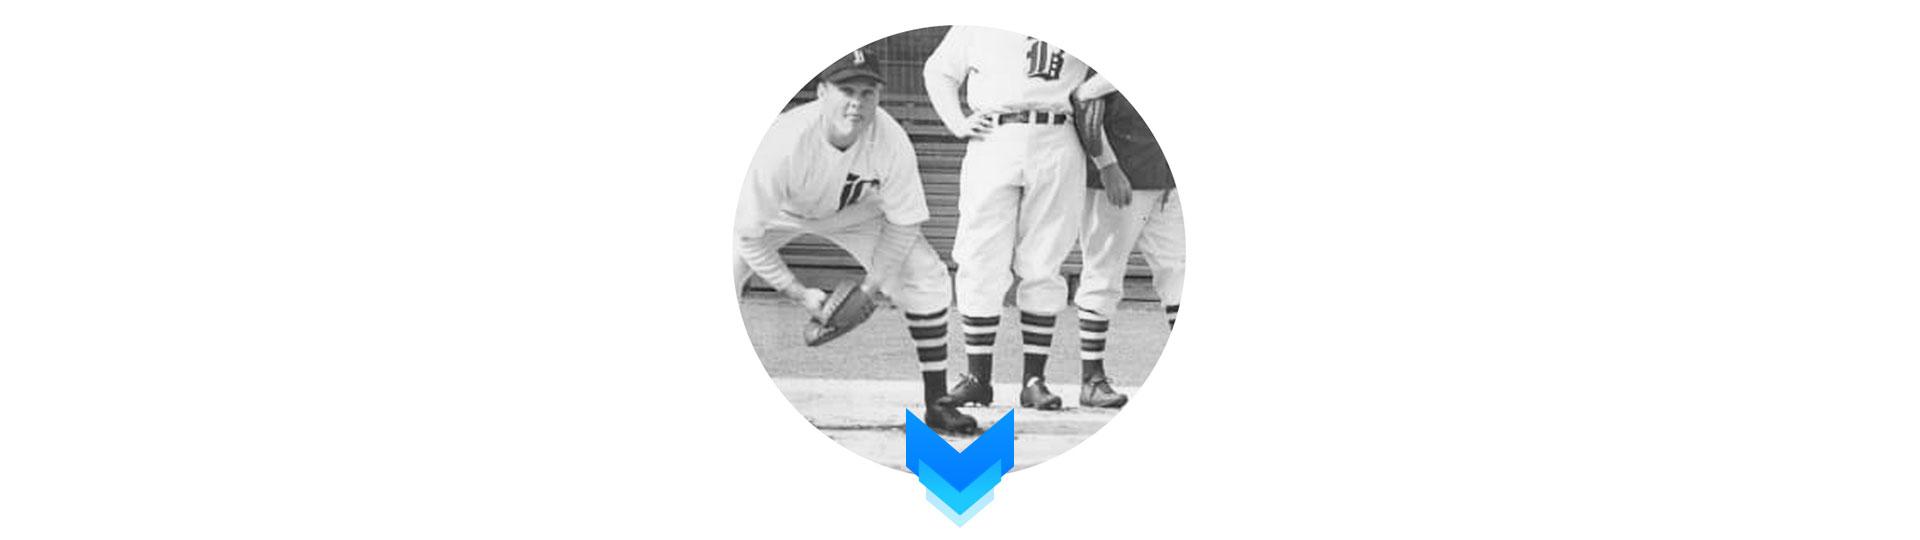 1941 2 - نیو بالانس